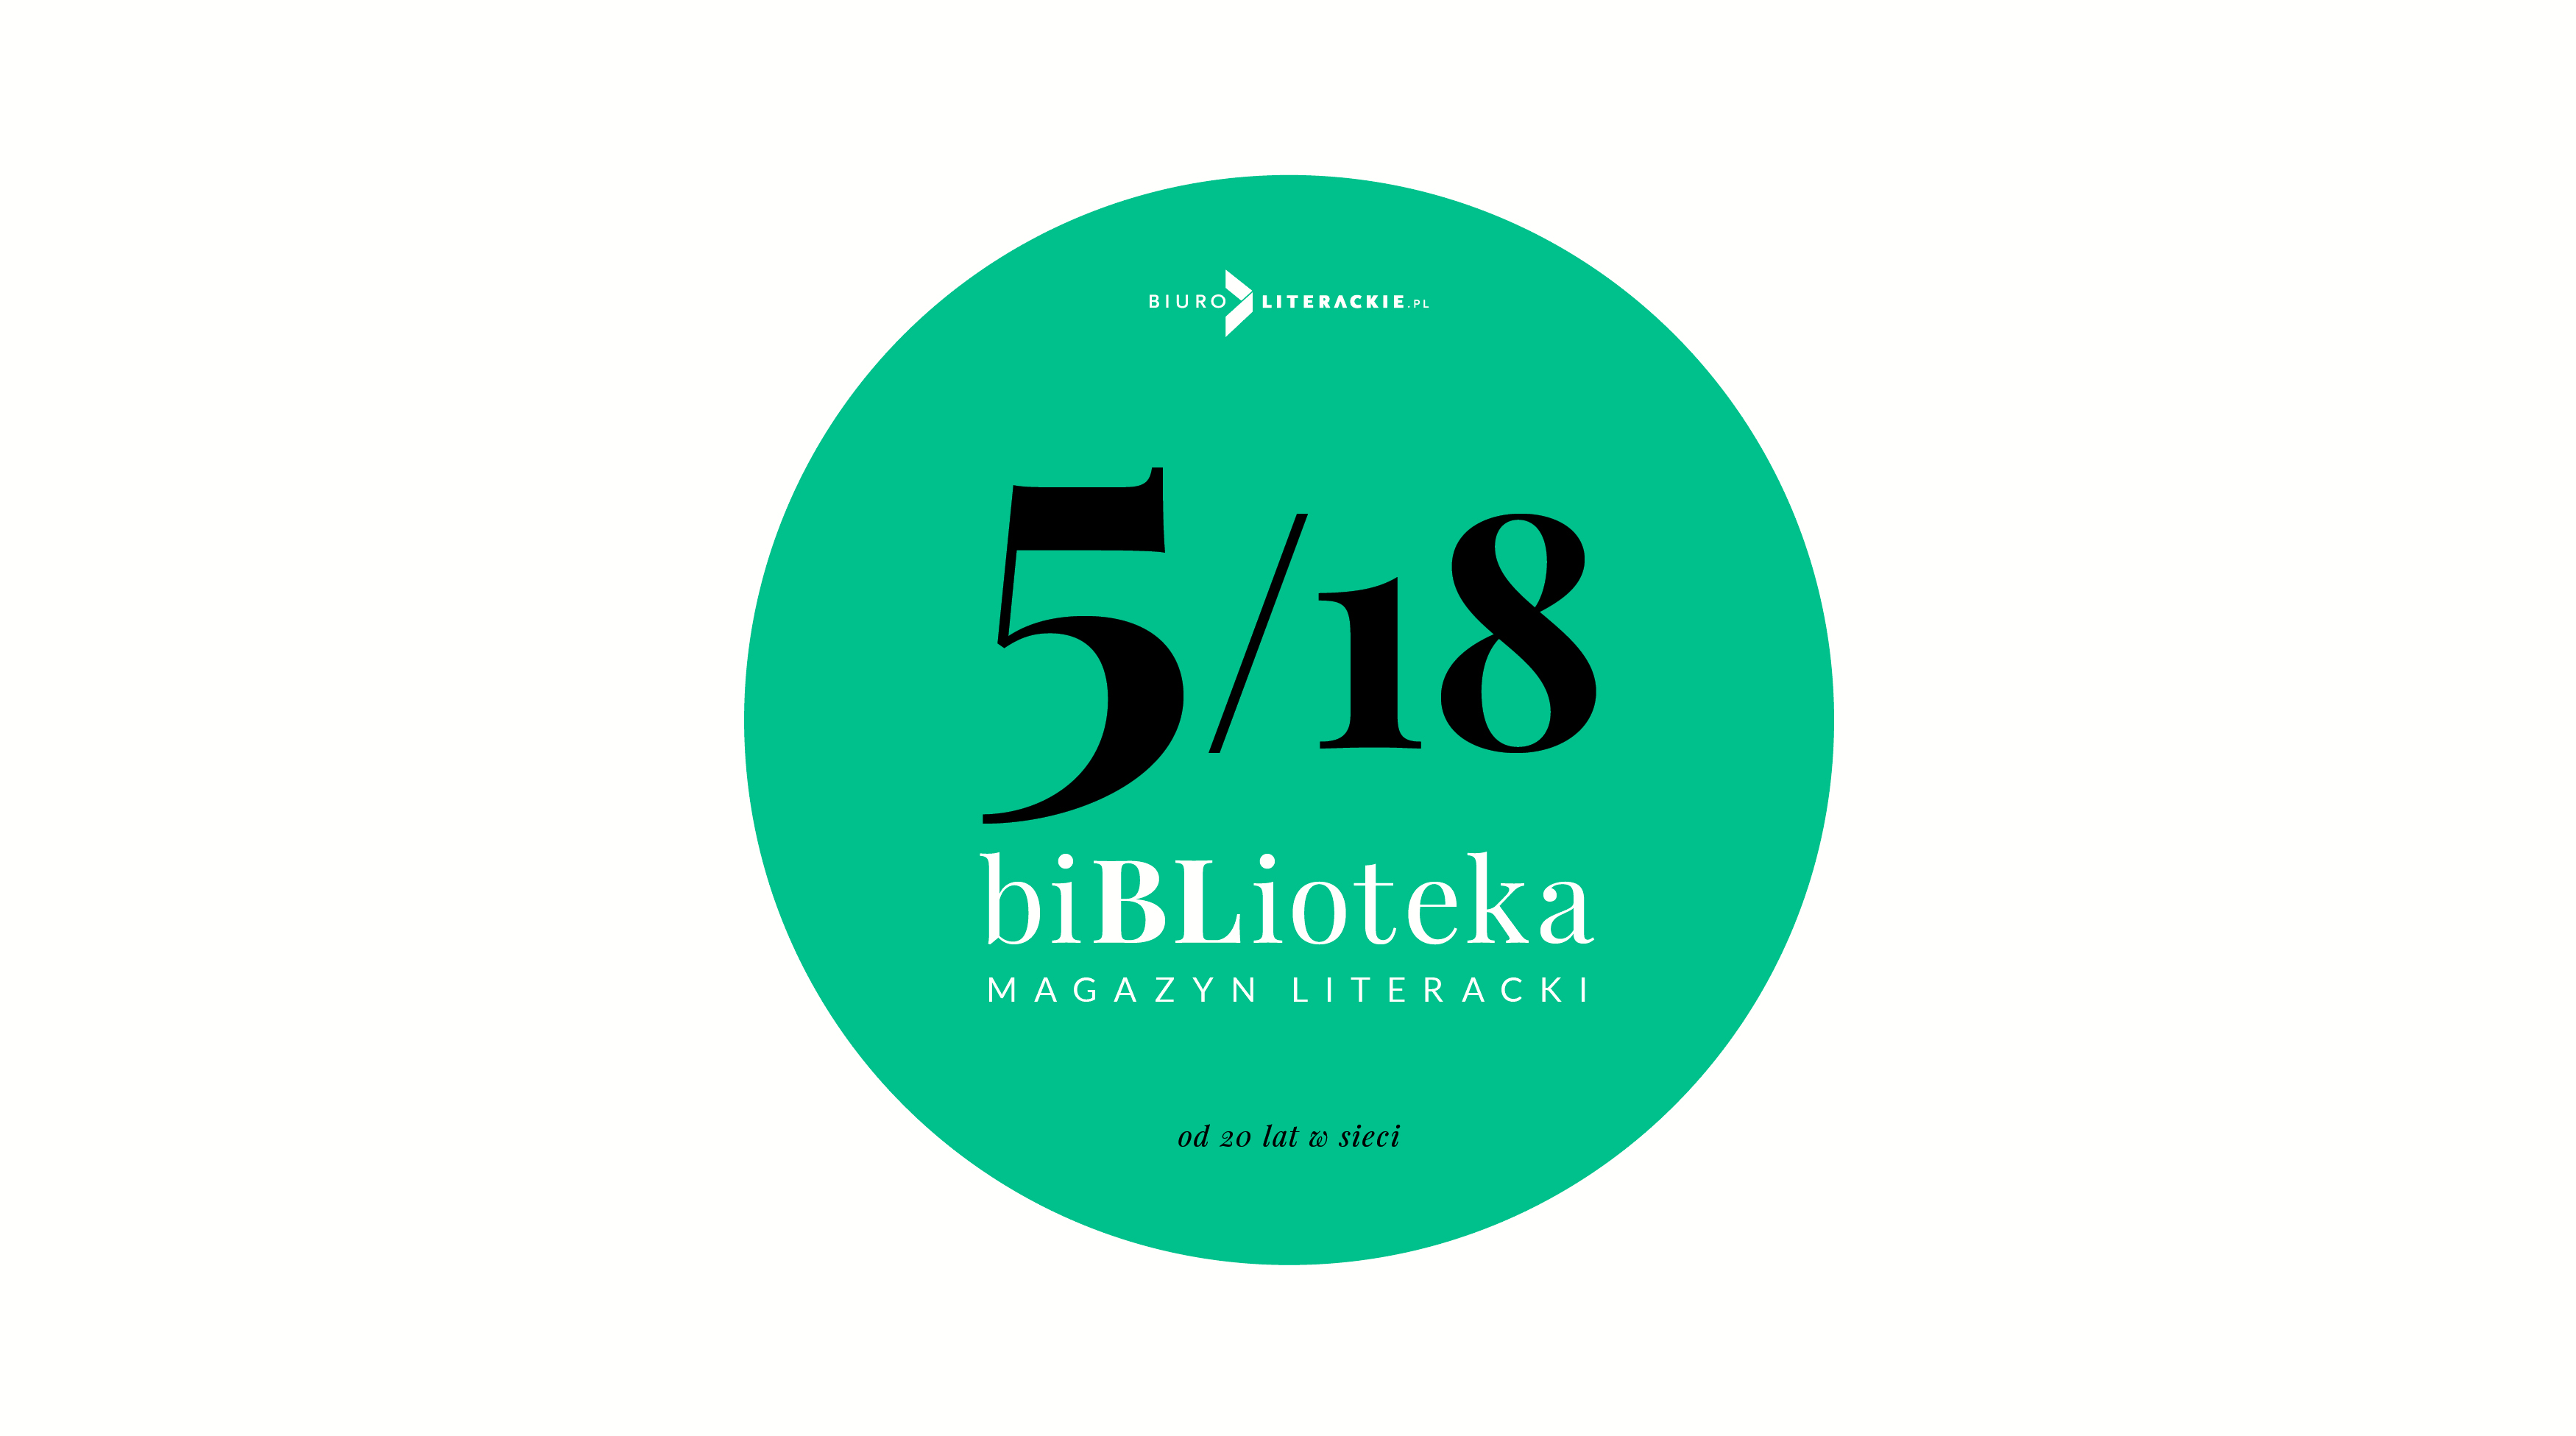 BL Img 2018.04.11 biBLioteka nr 5__www_top